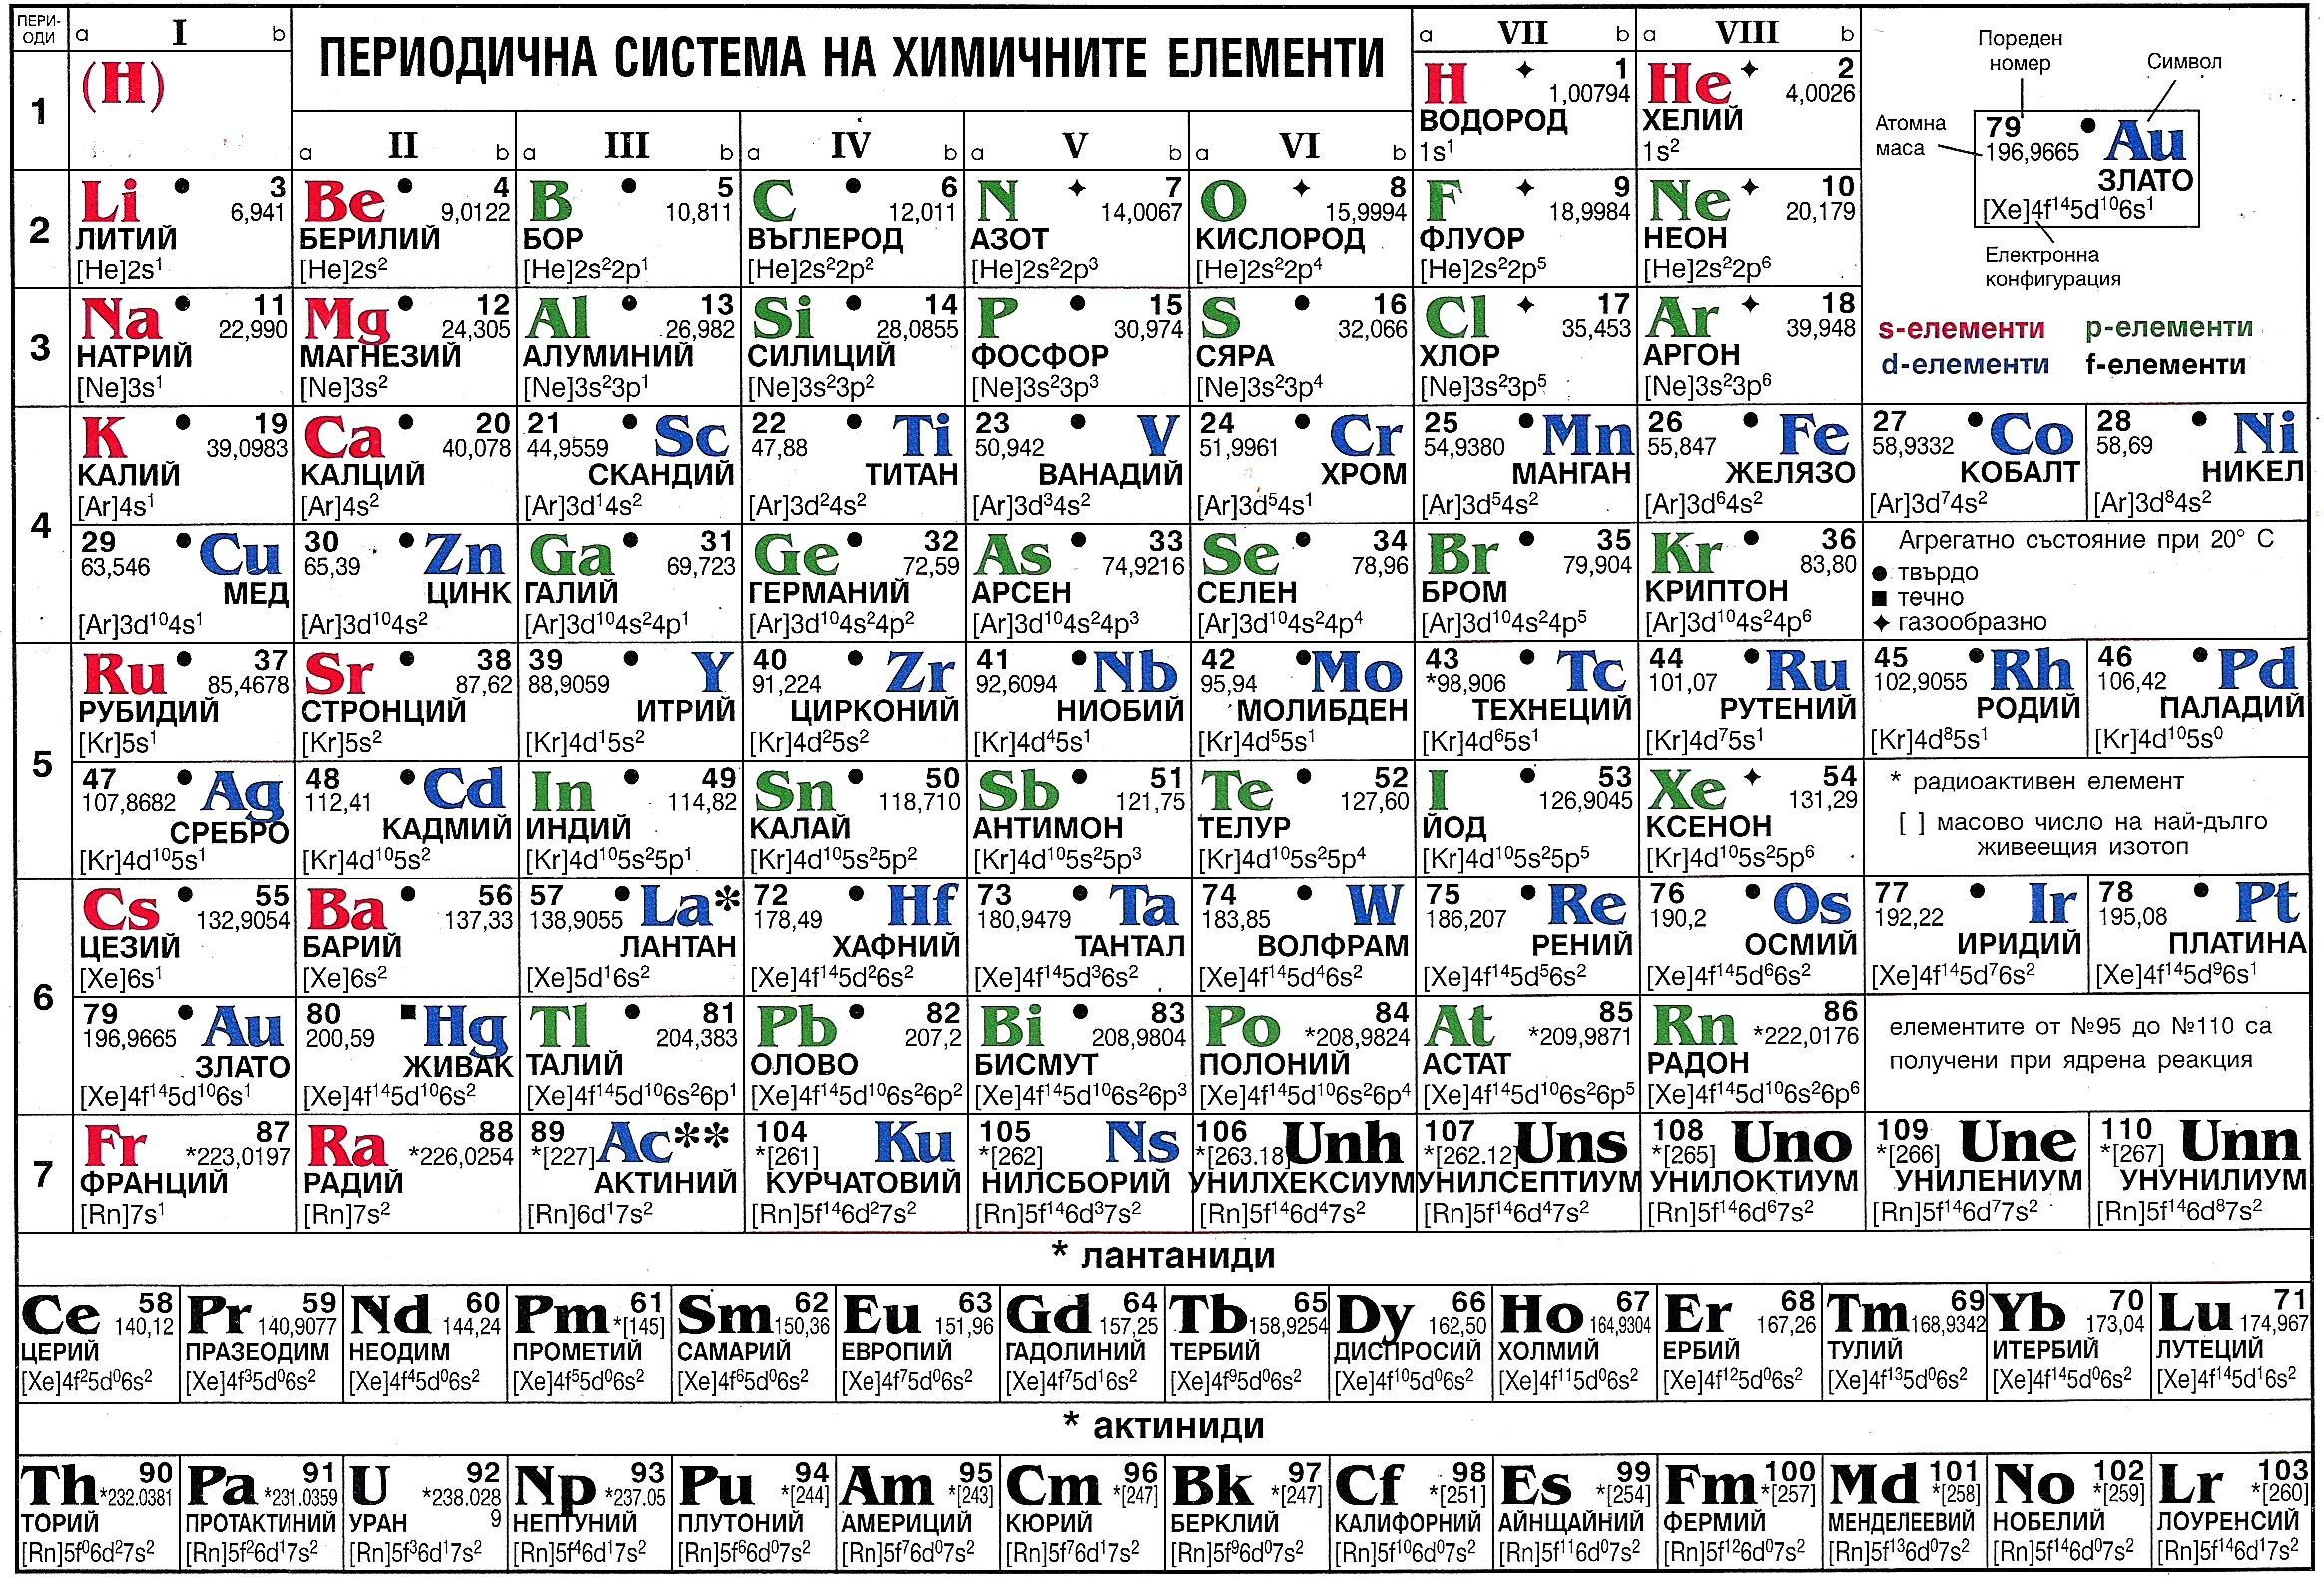 Периодична система на всички химични елементи Менделеевата таблица